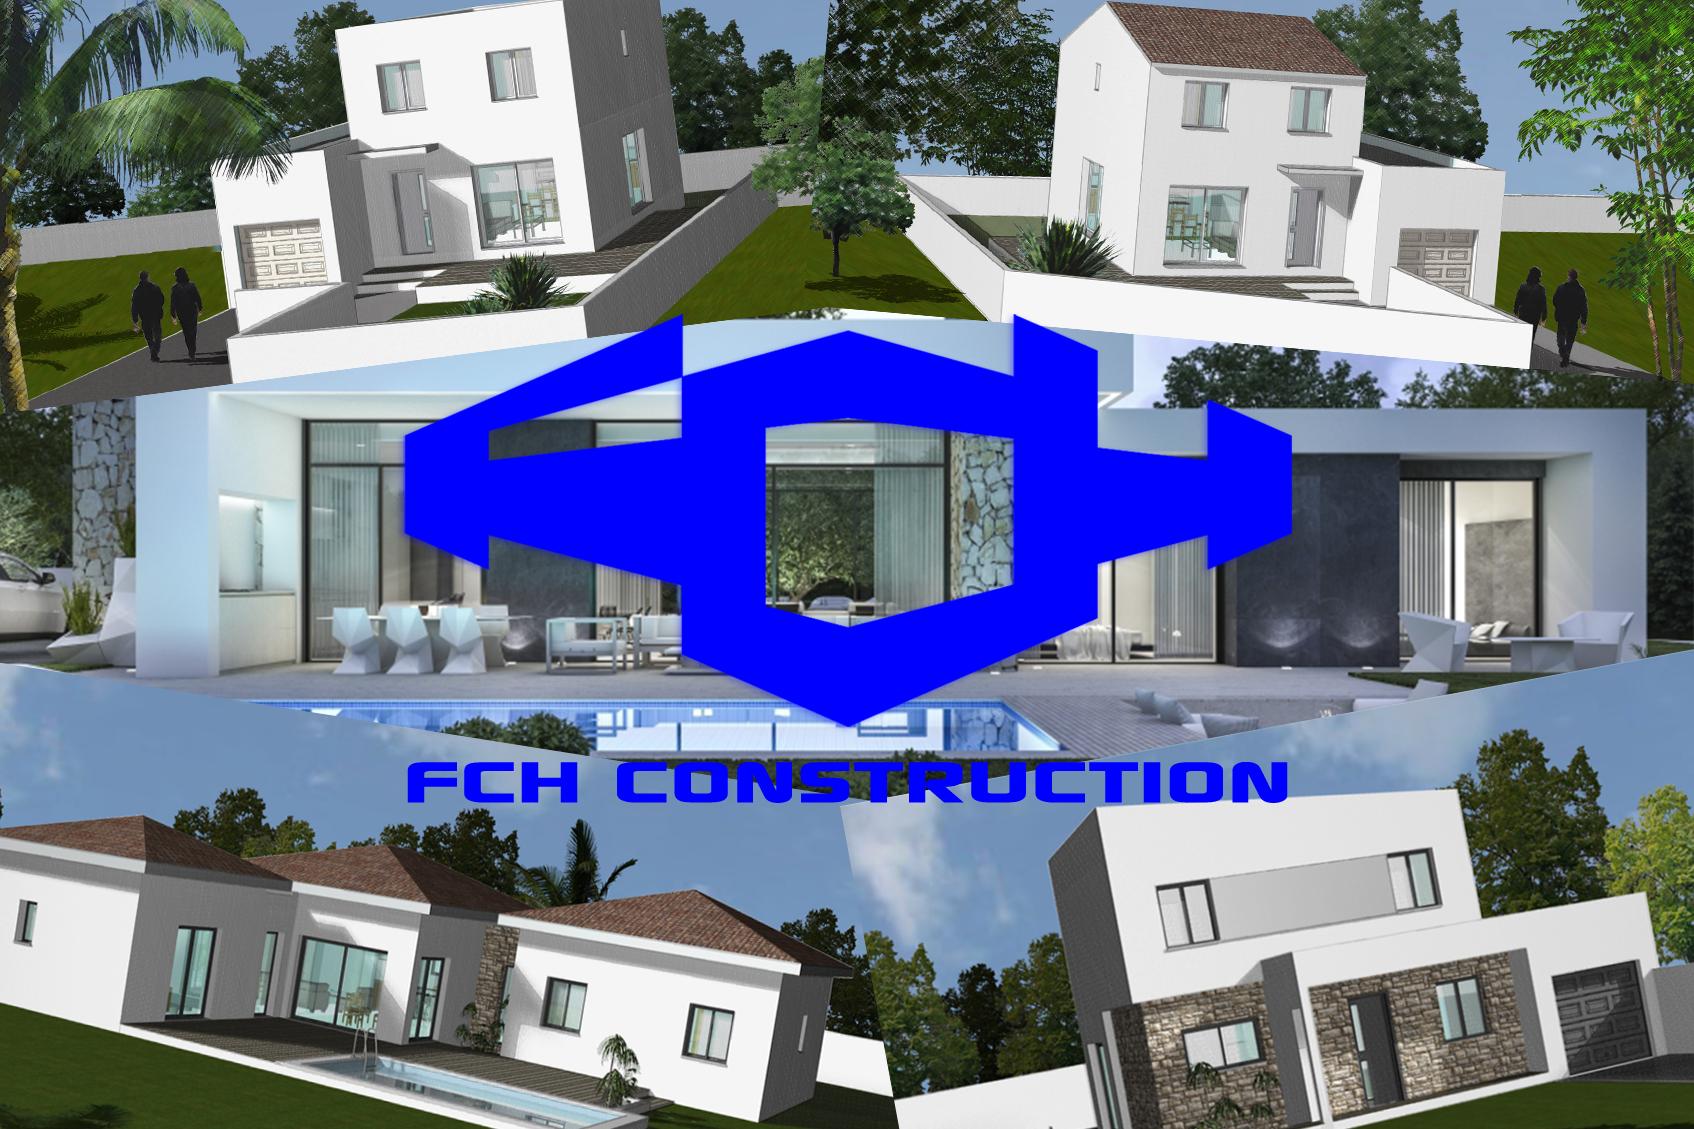 FCH CONSTRUCTION